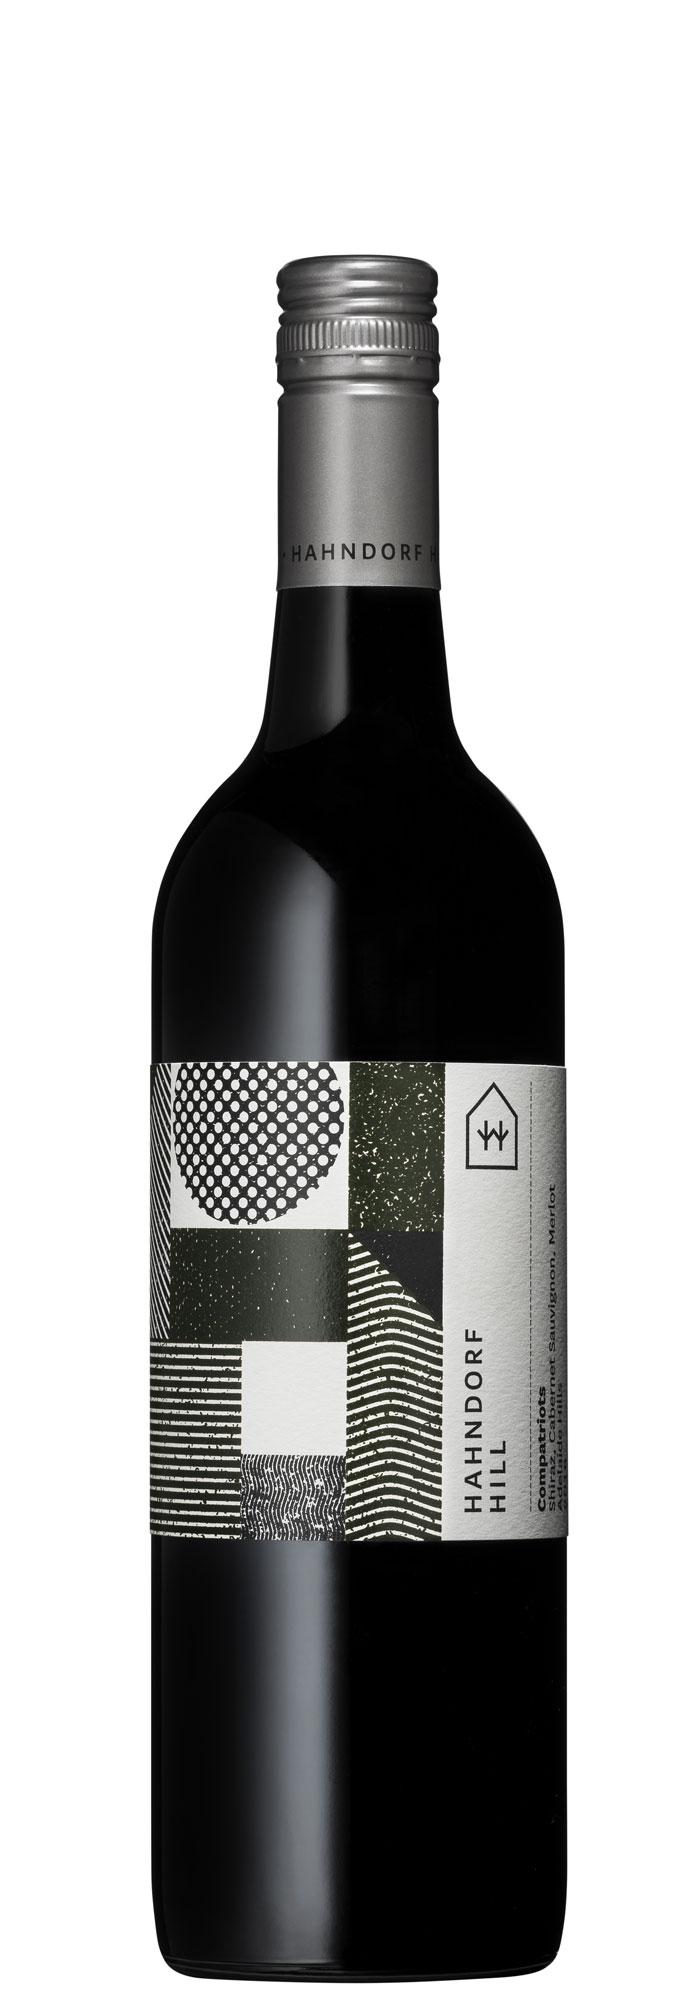 Hahndorf Hill Winery Compatriots 2016